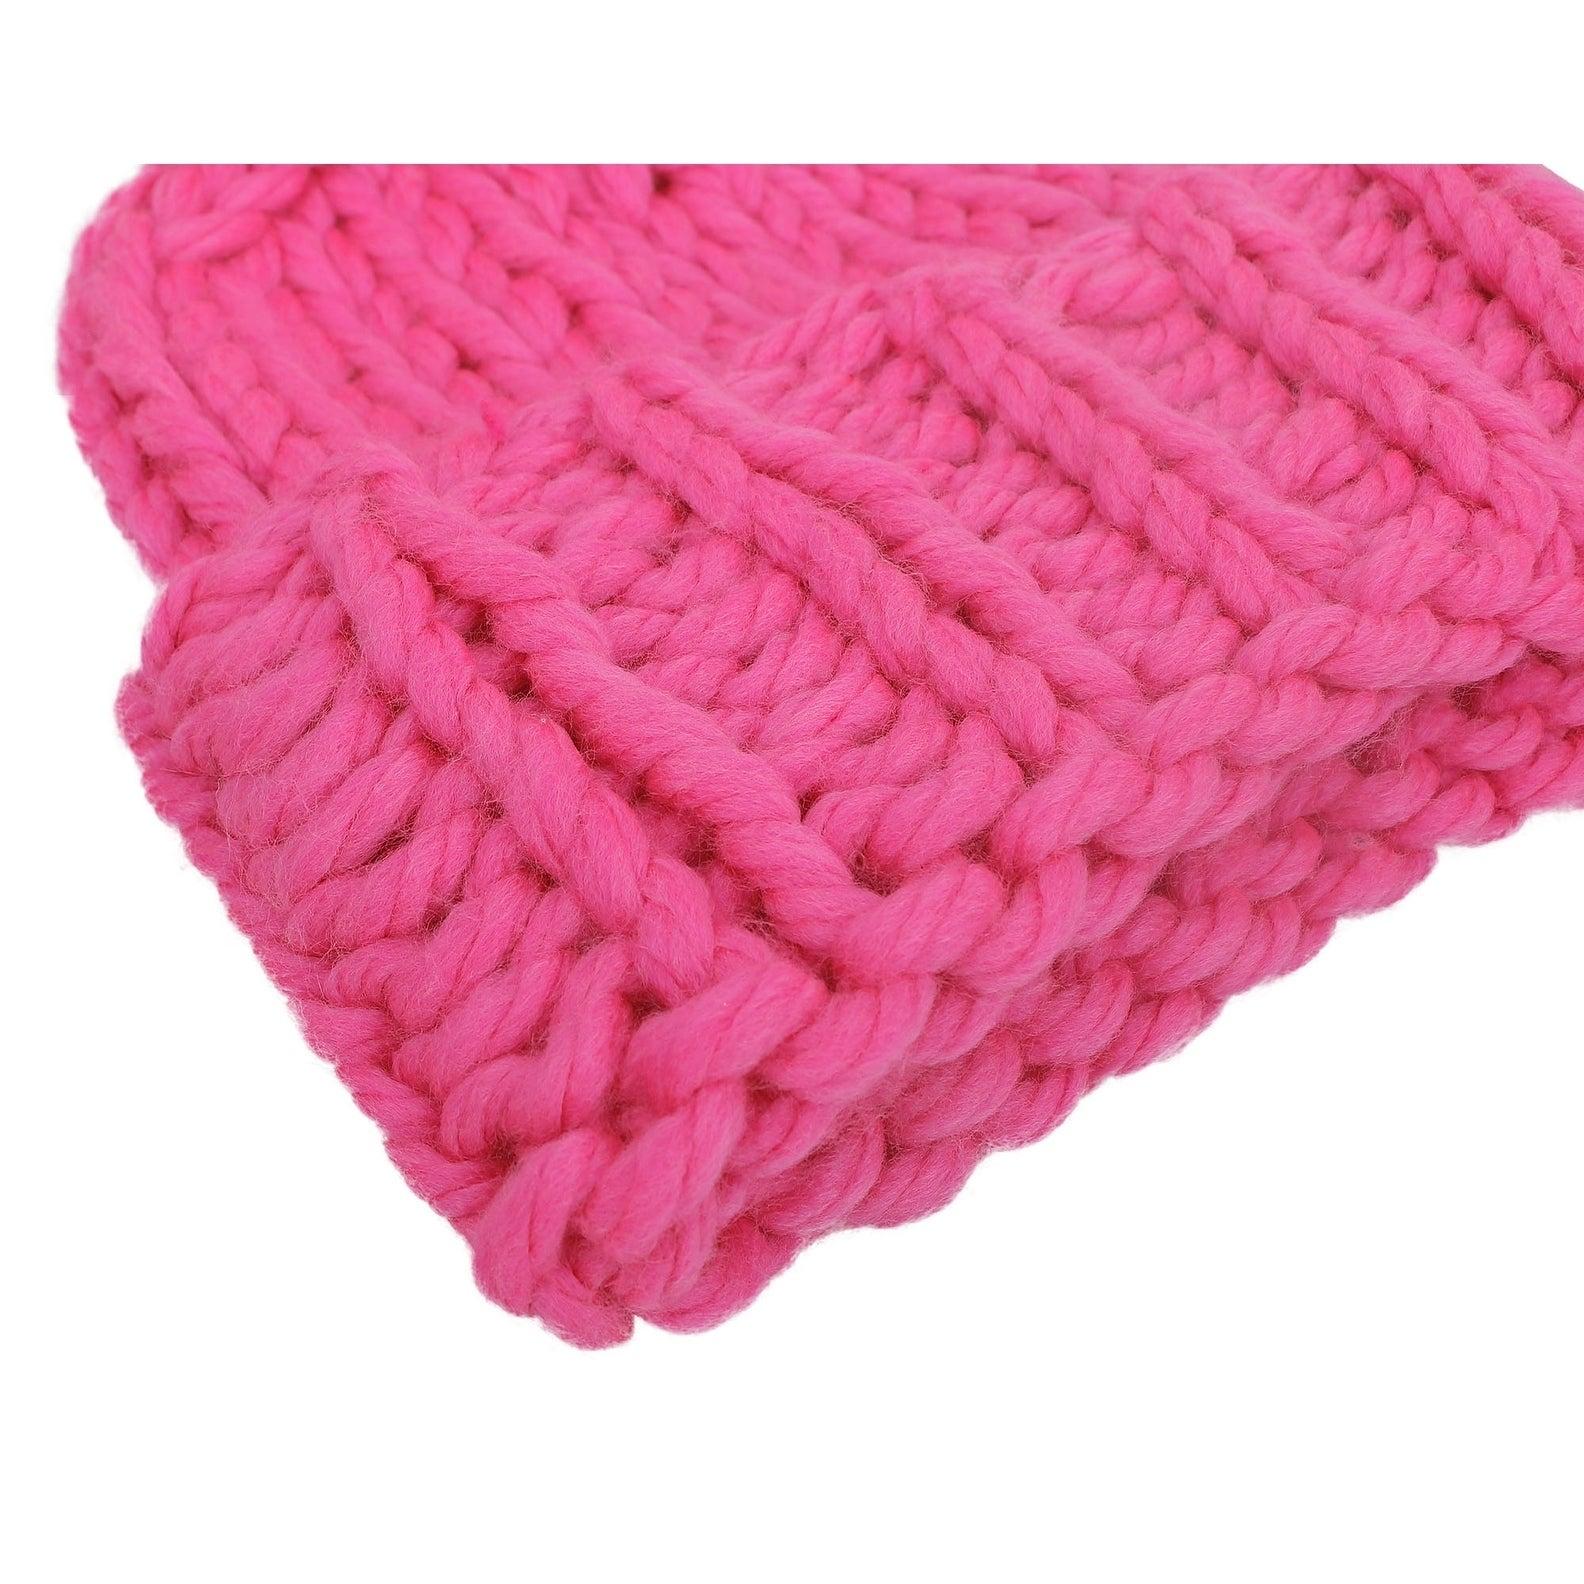 d21275c3b939f8 Arctic Paw Women's Super Soft Chunky Cable Knit Pompom Beanie | eBay